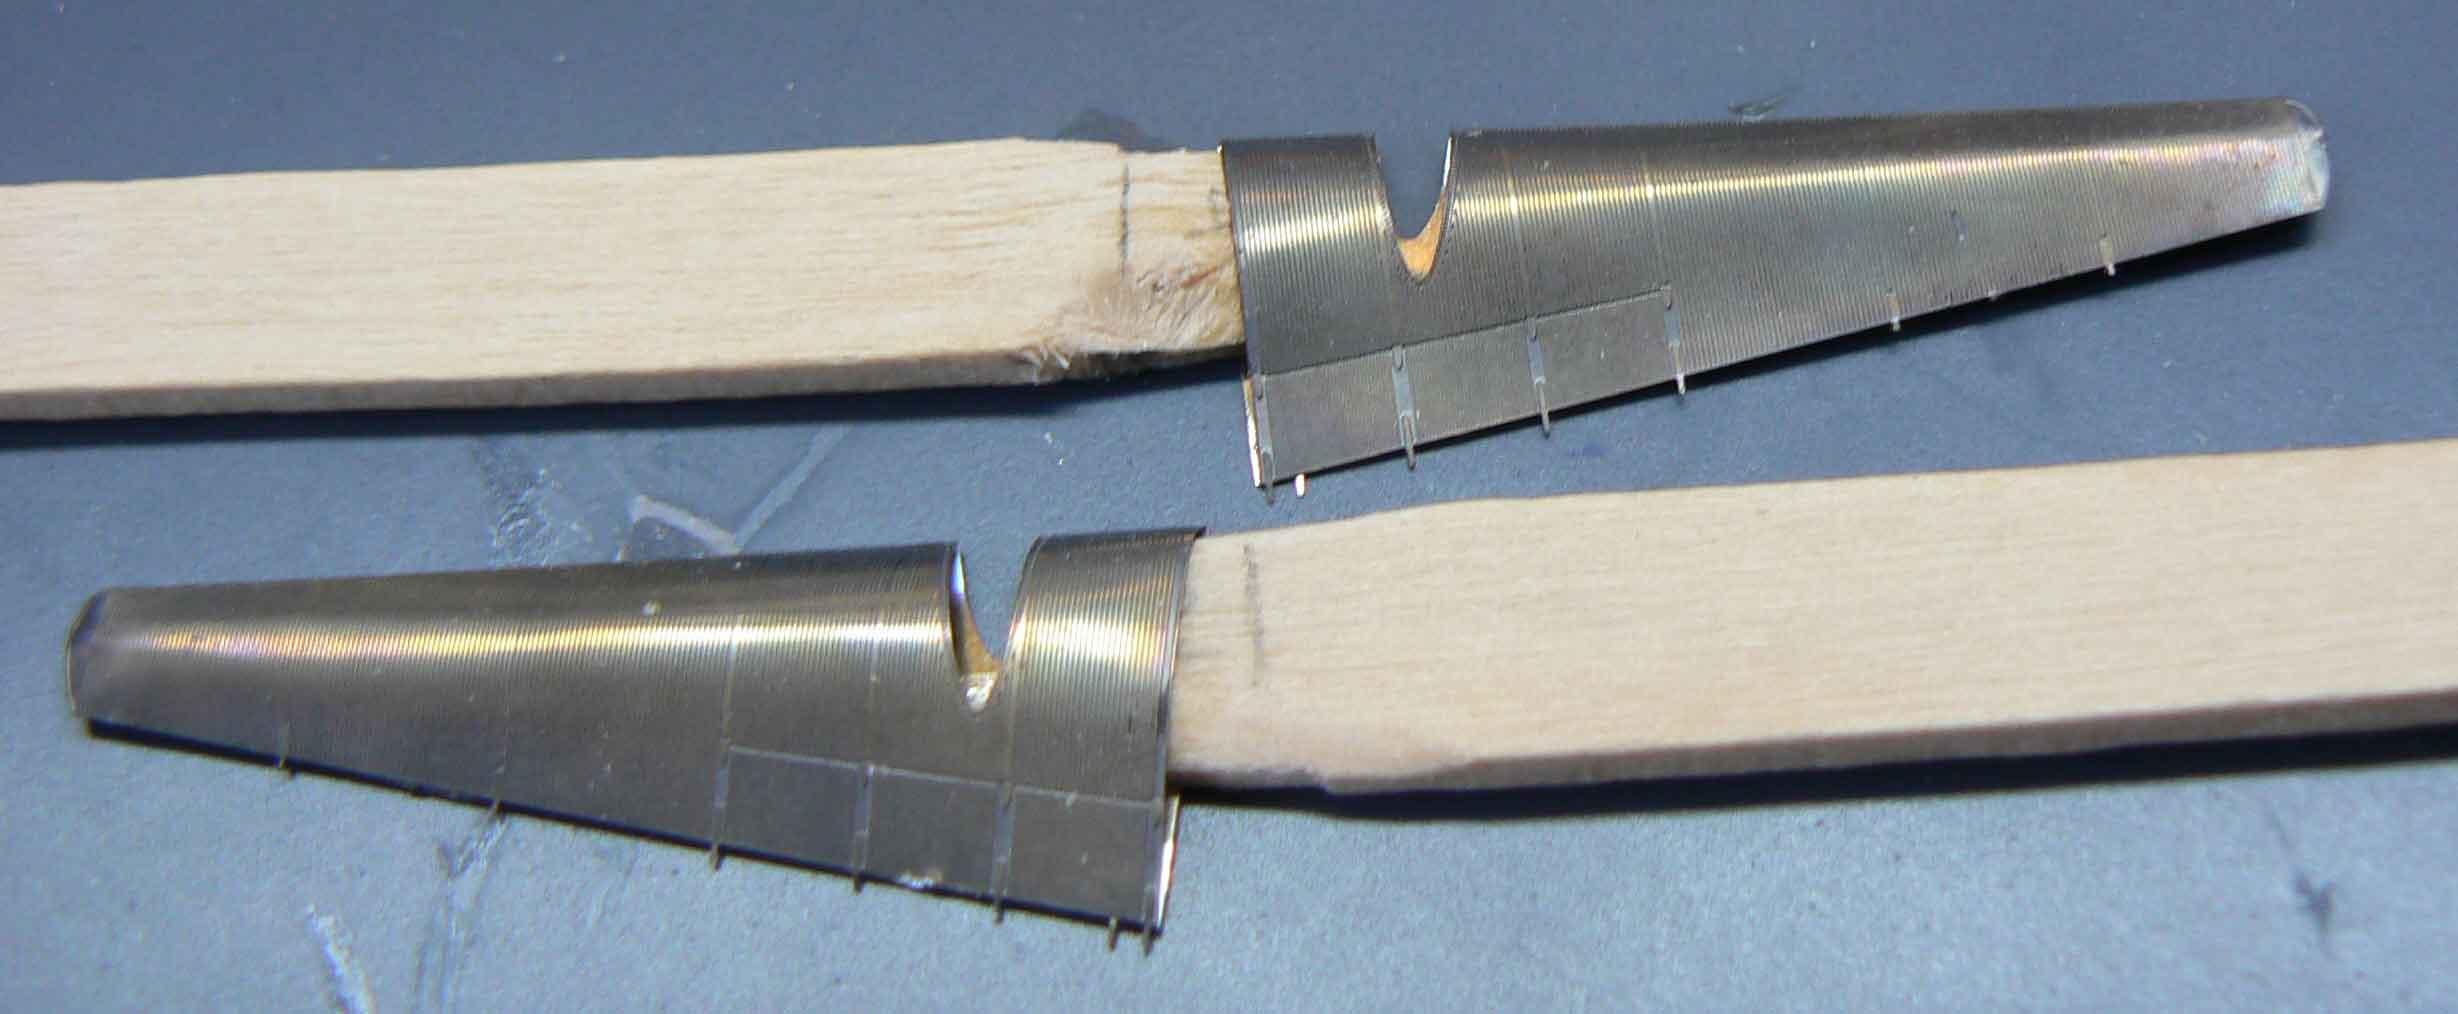 JU 52 1/350 en photodécoupe QsK1mQ